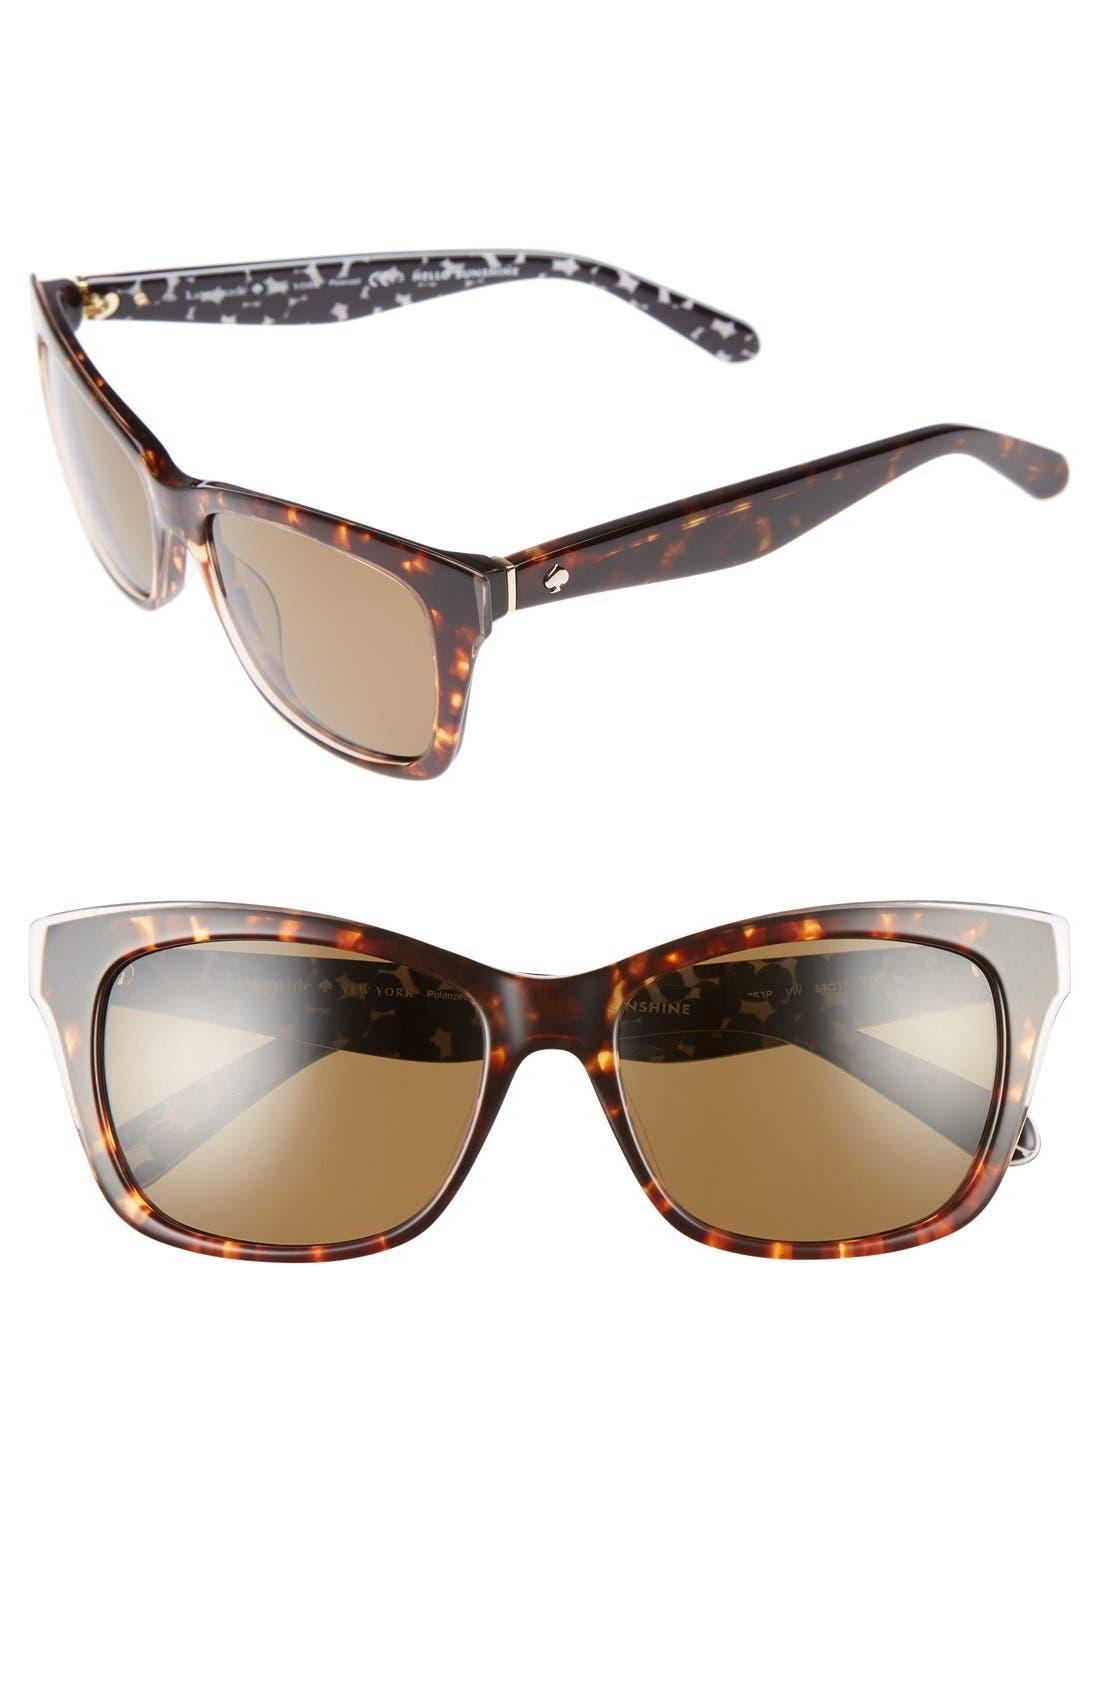 jenae 53mm polarized sunglasses,                         Main,                         color, Havana/ Cream/ Transparent